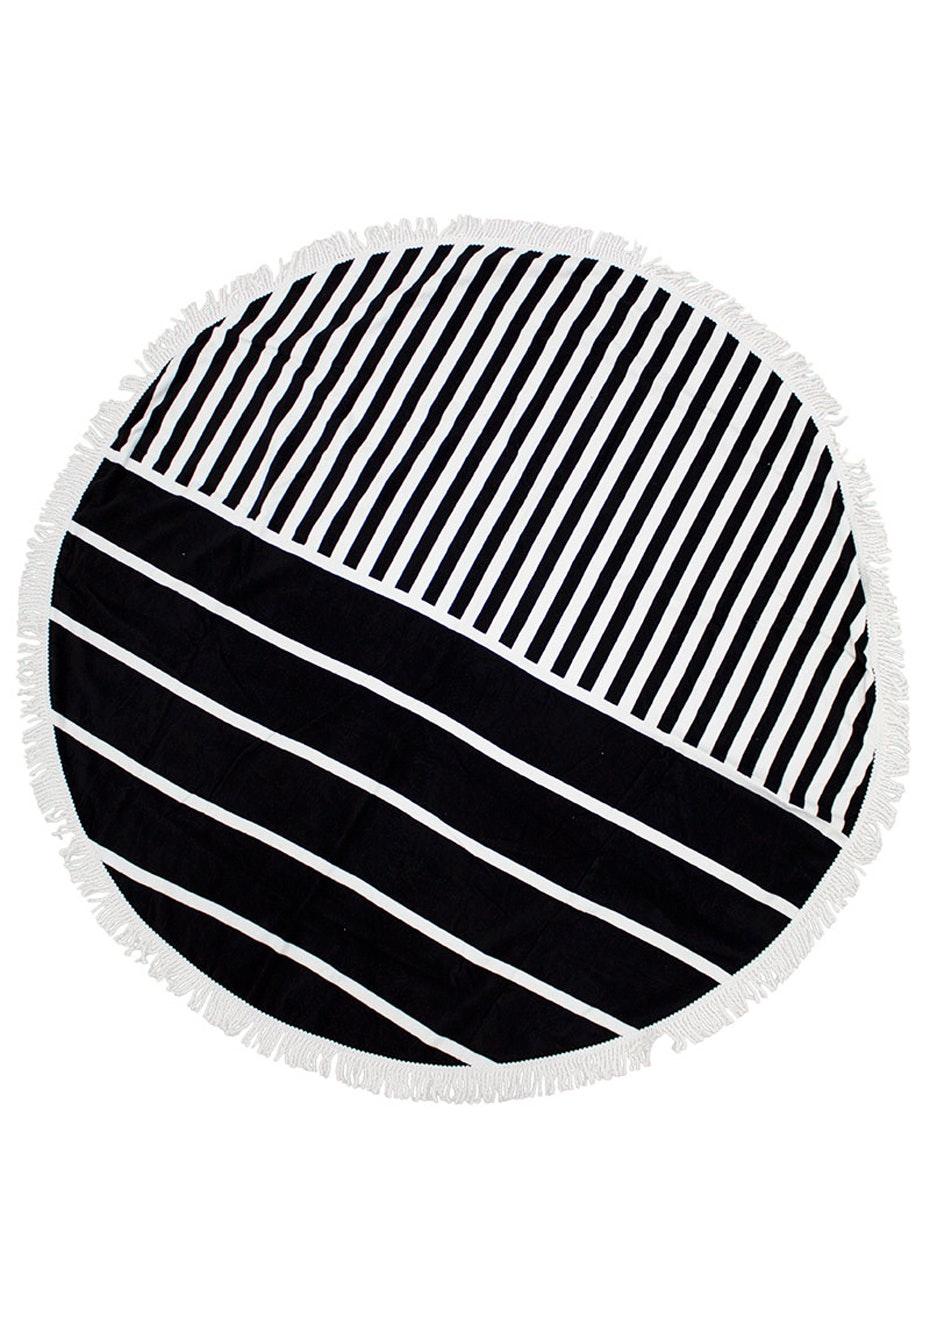 Round Beach Towel With Fringing - Black